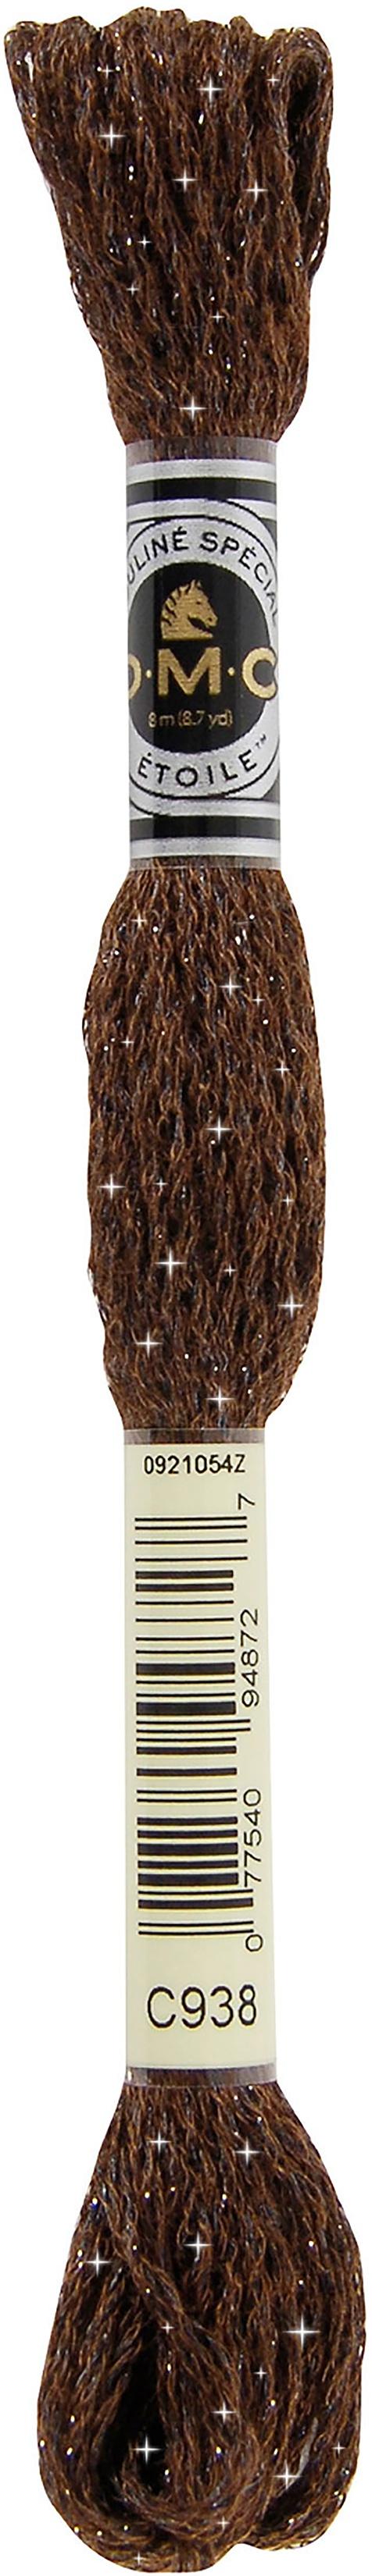 DMC 6-Strand Etoile Embroidery Floss 8.7yd-Ultra Dark Coffee Brown